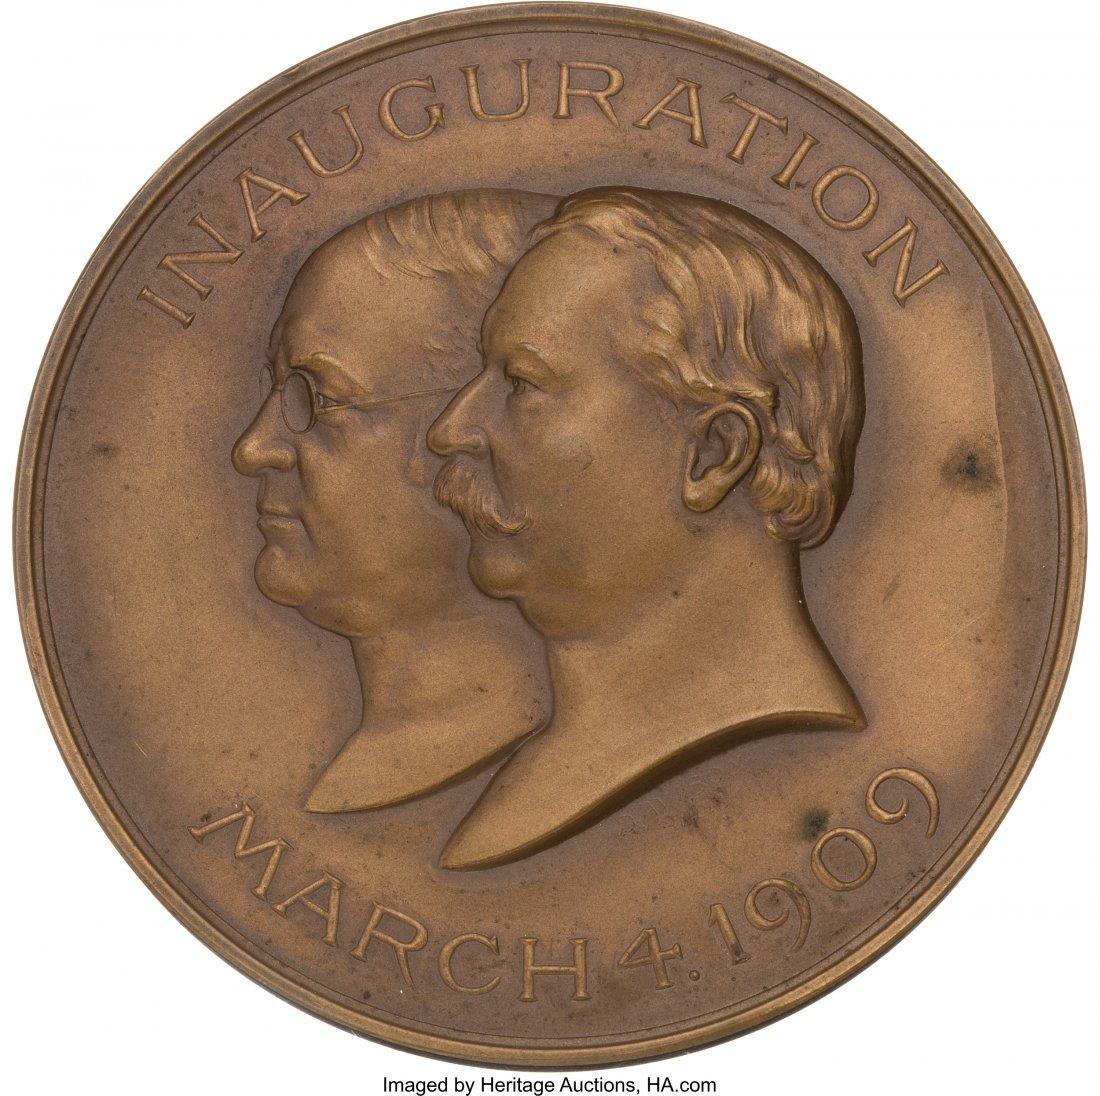 43493: William Howard Taft: Official Inaugural Medal in